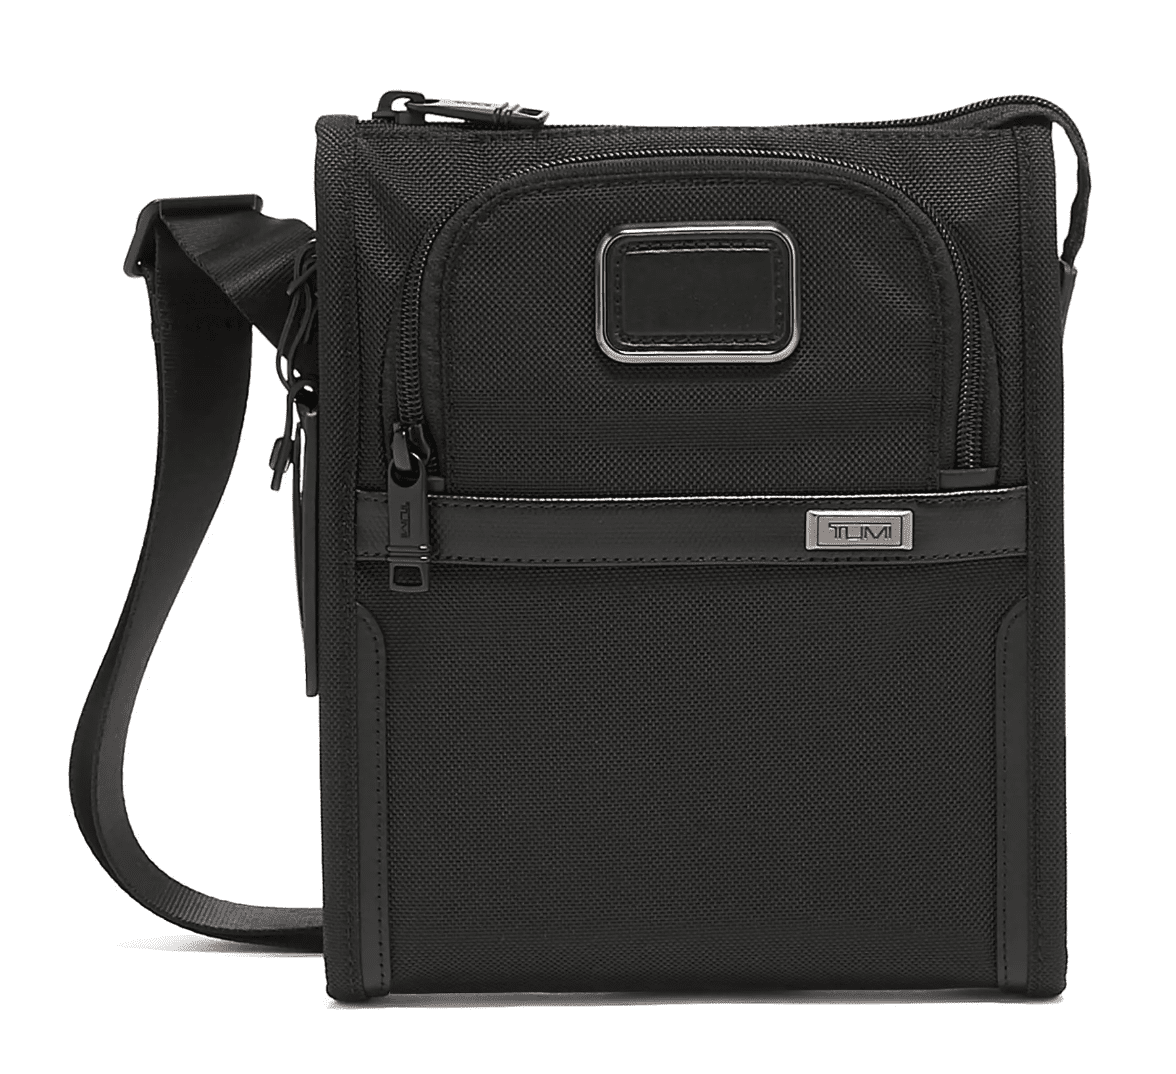 Tumi Alpha 3 Small Pocket Crossbody Bag